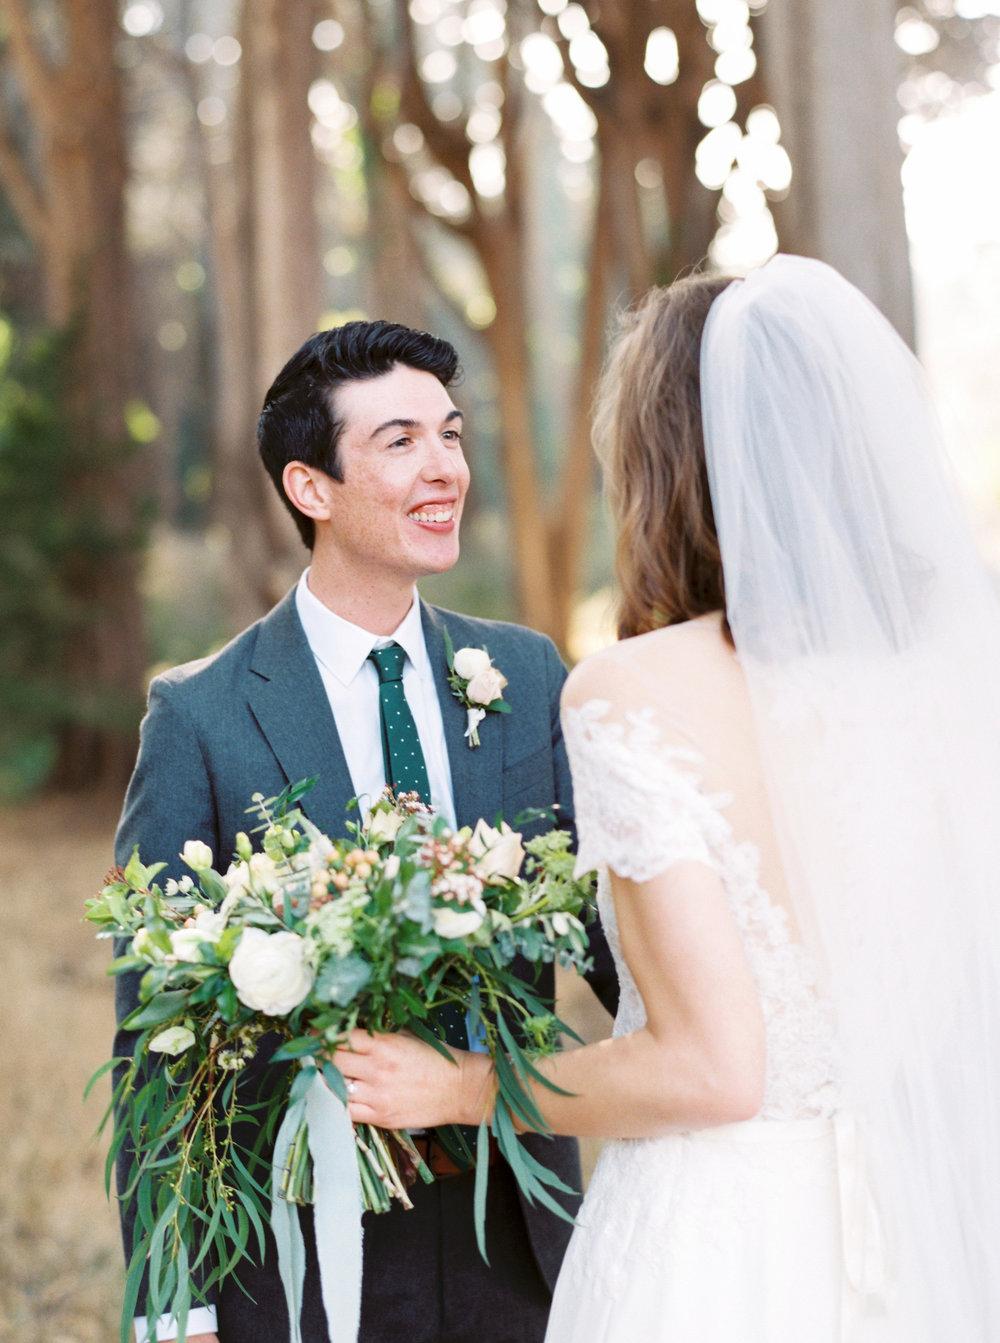 Log-cabin-wedding-in-presidio-san-francisco-california-desintation-wedding-photography-33.jpg